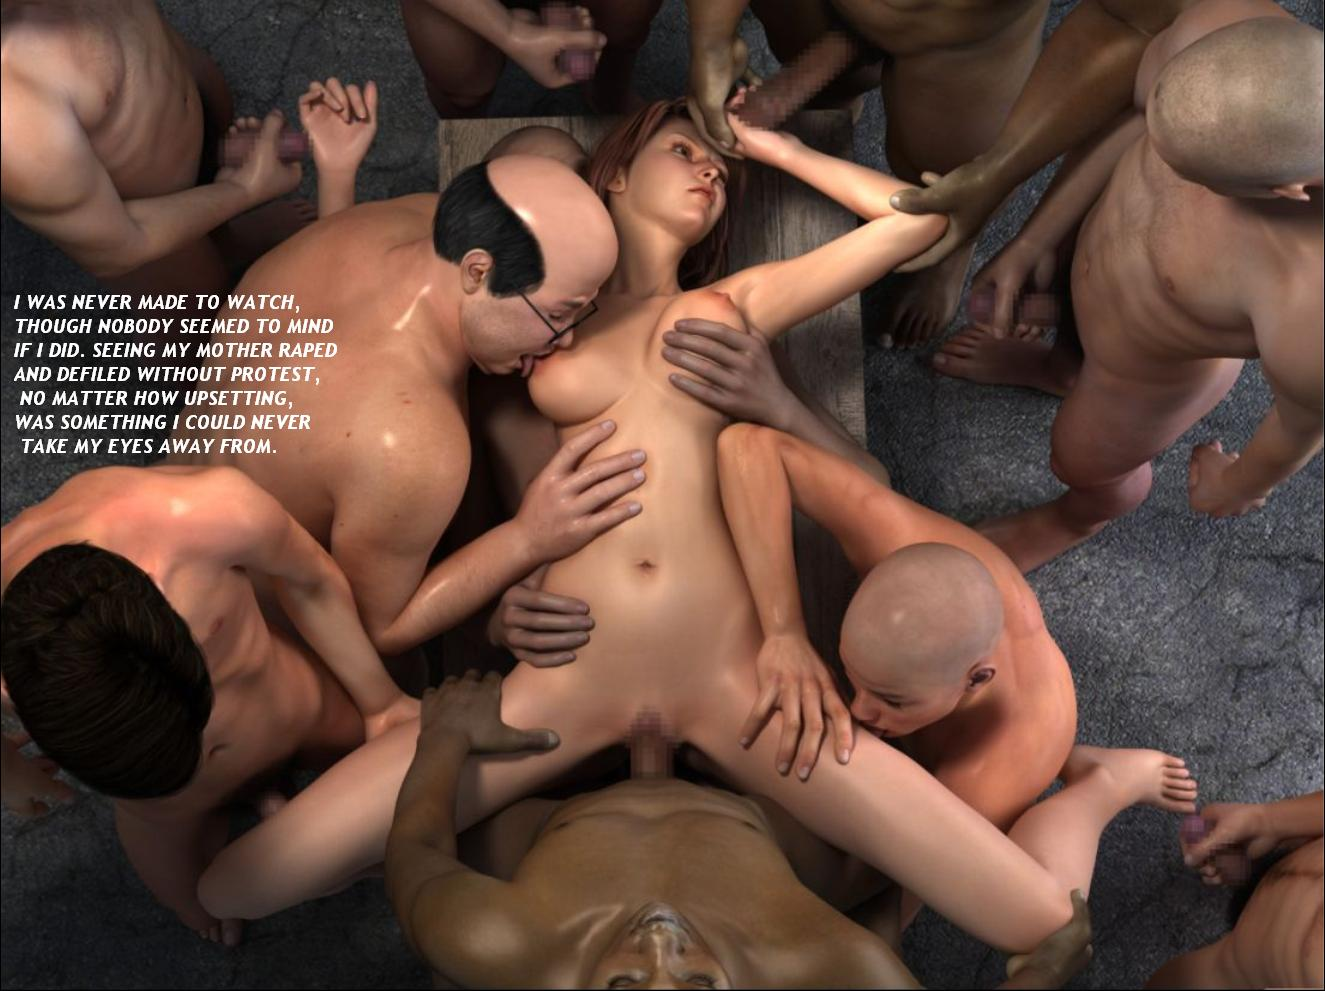 Elfgirlsexy erotic image